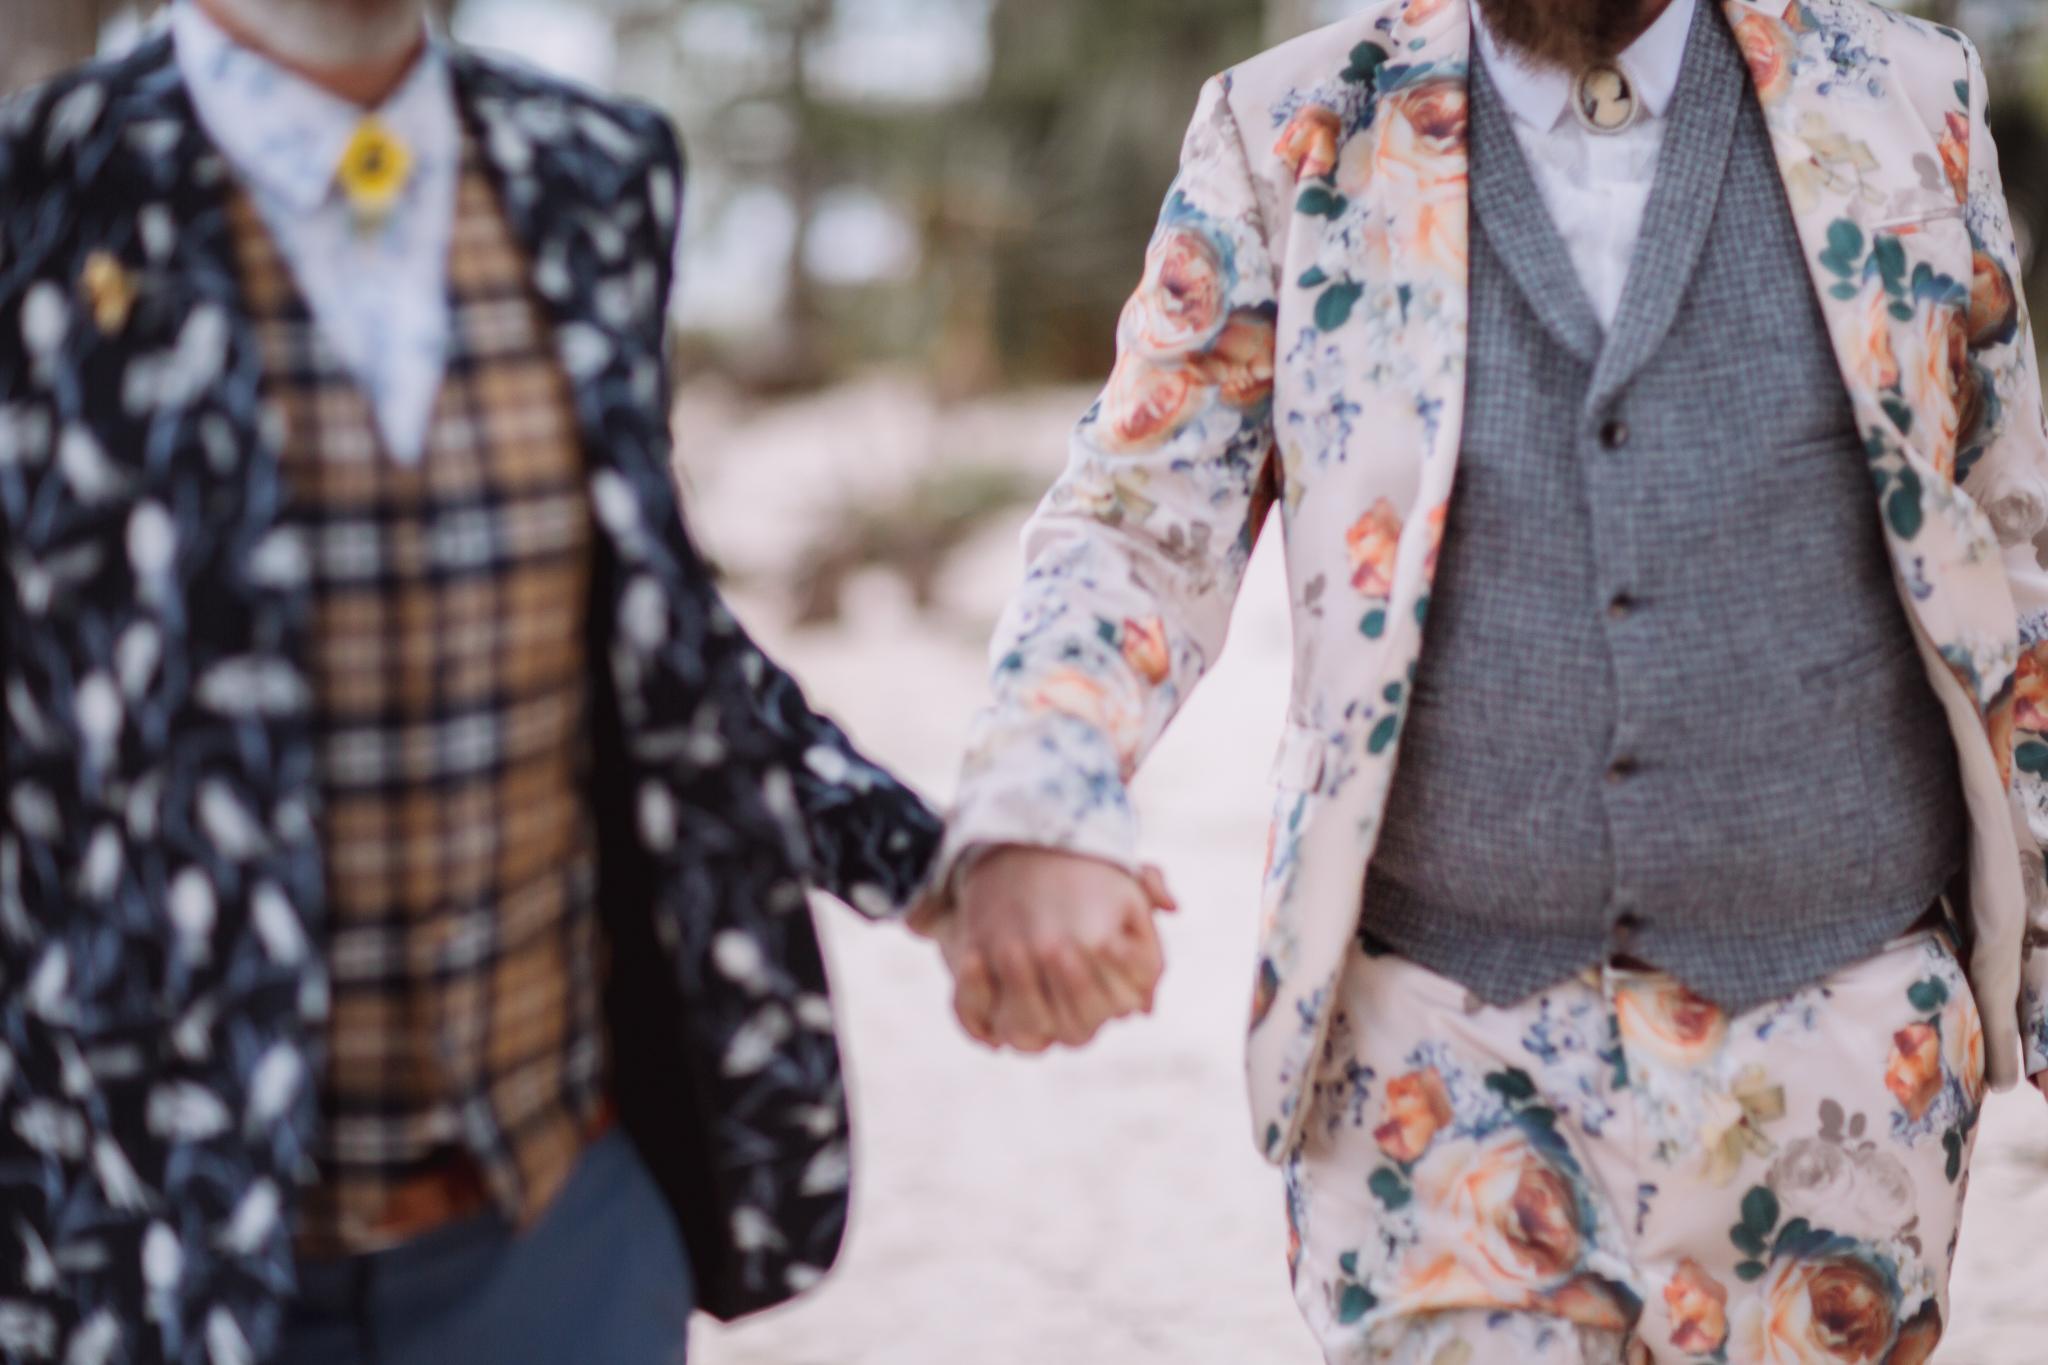 Tim and David - New orleans Wedding - Kallistia Photography-6.jpg